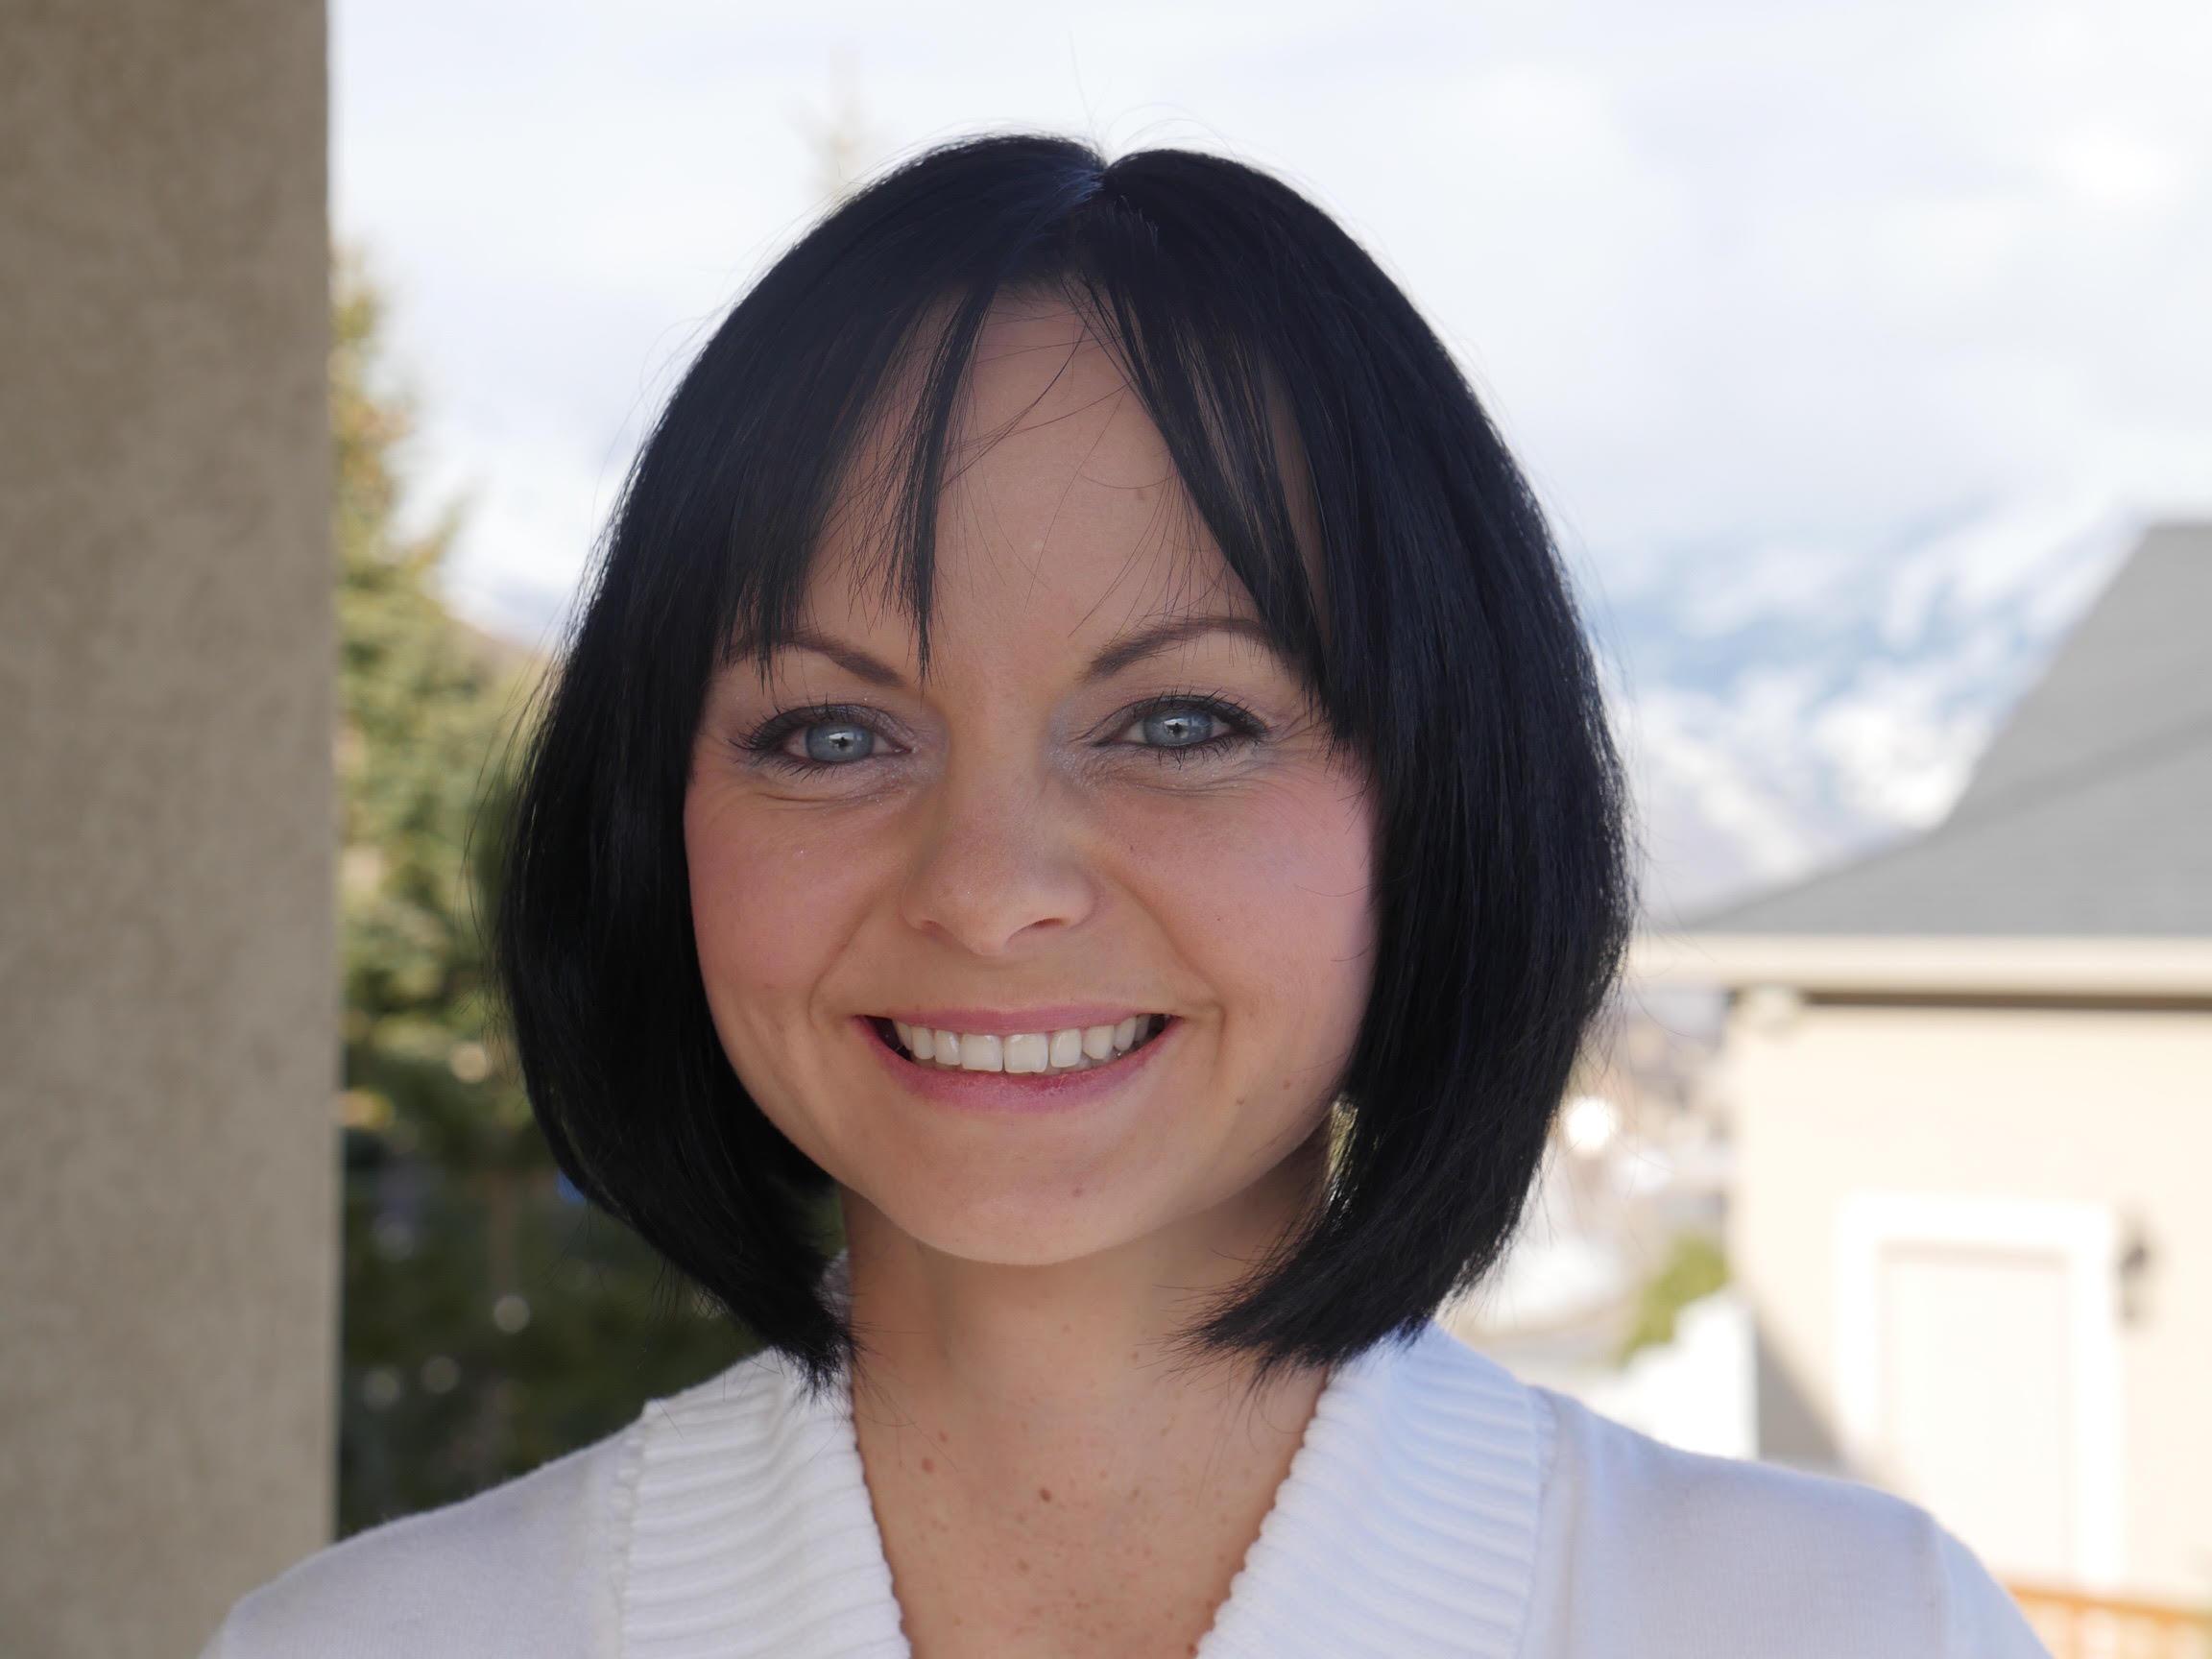 Unified Family Therapist Aleksandra Sinclair LMHC